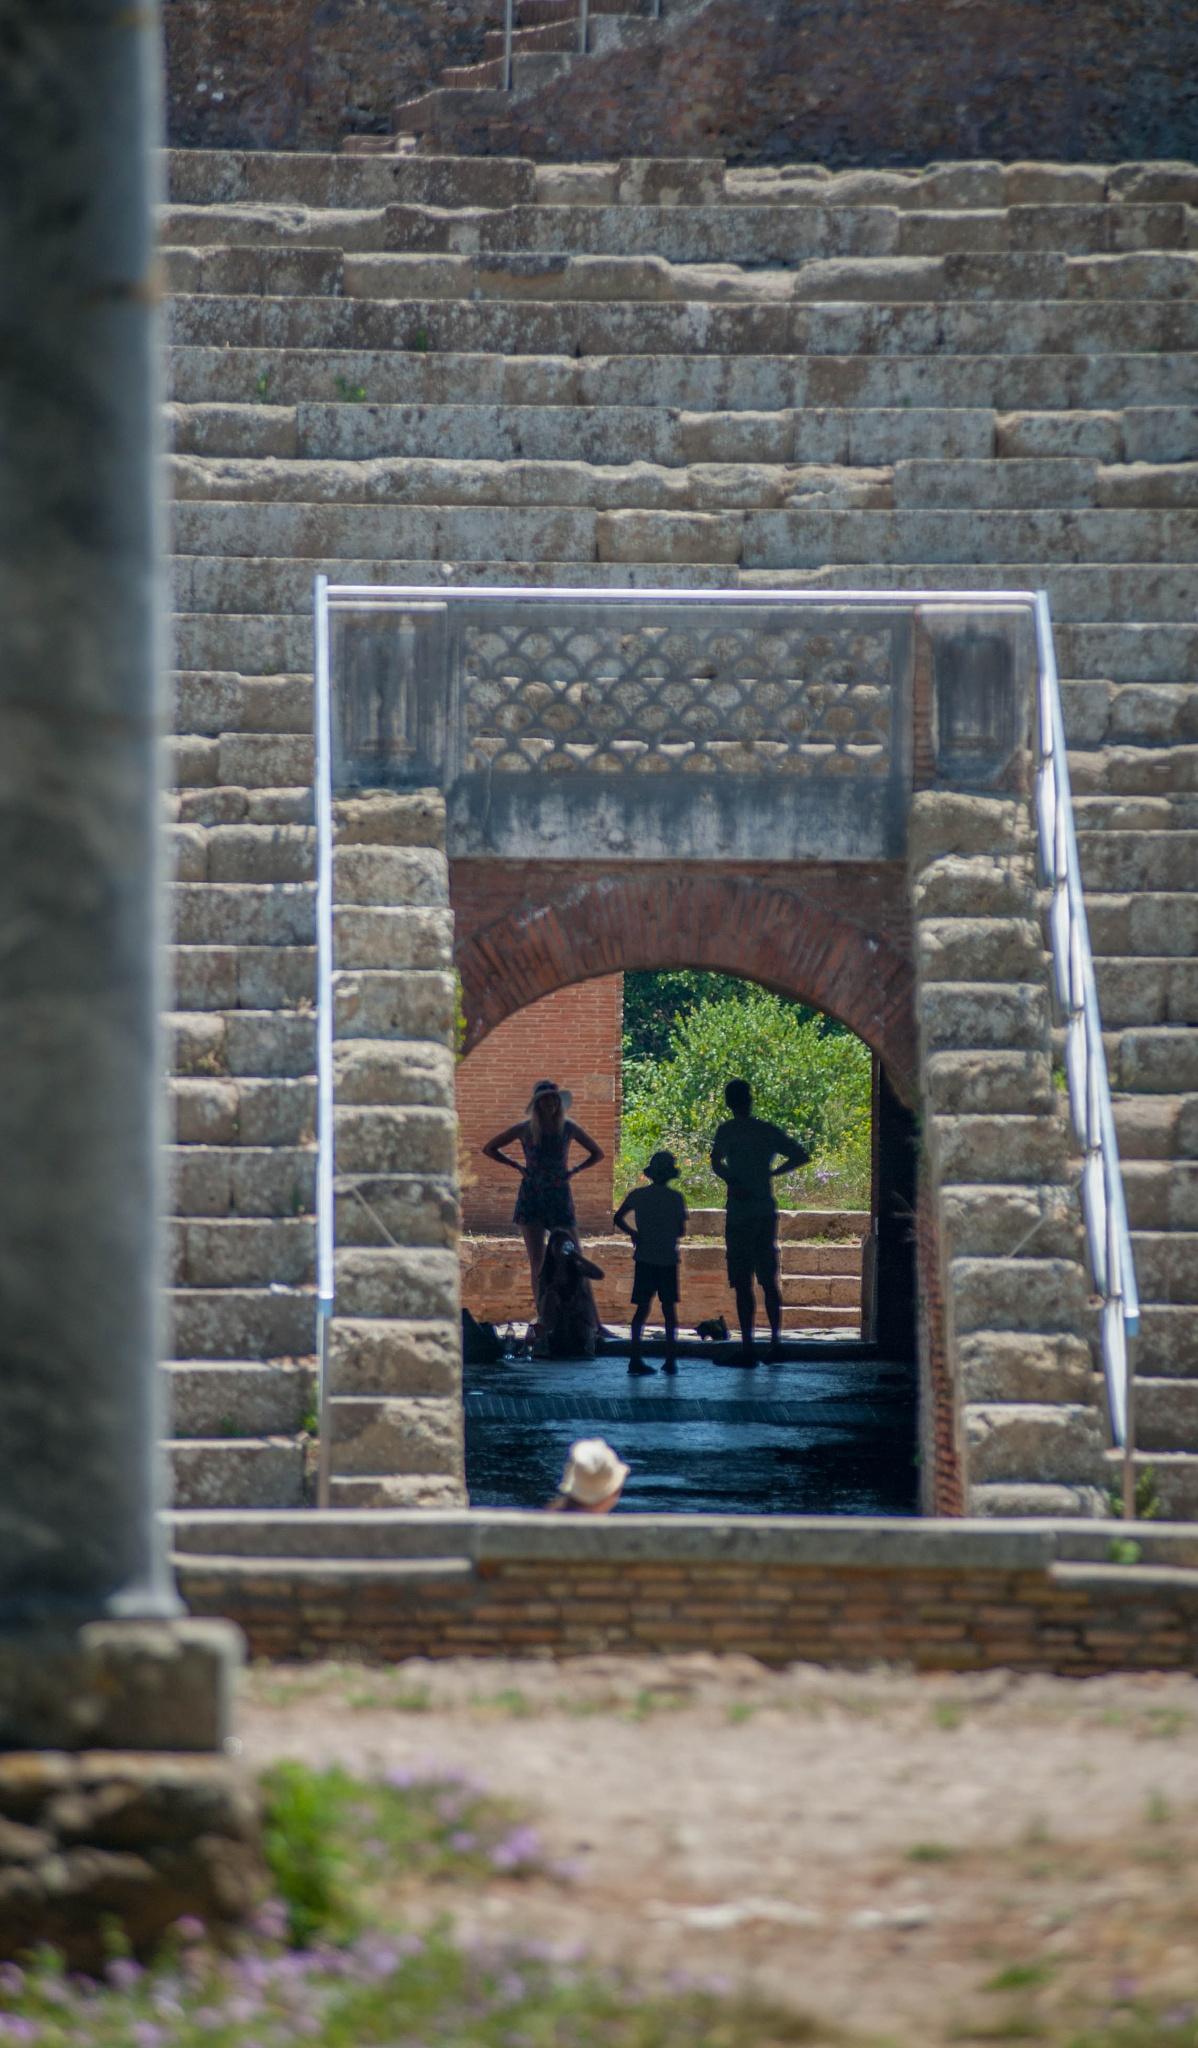 A Doorway to History - Ovi historiaan by Pauliina Kuikka